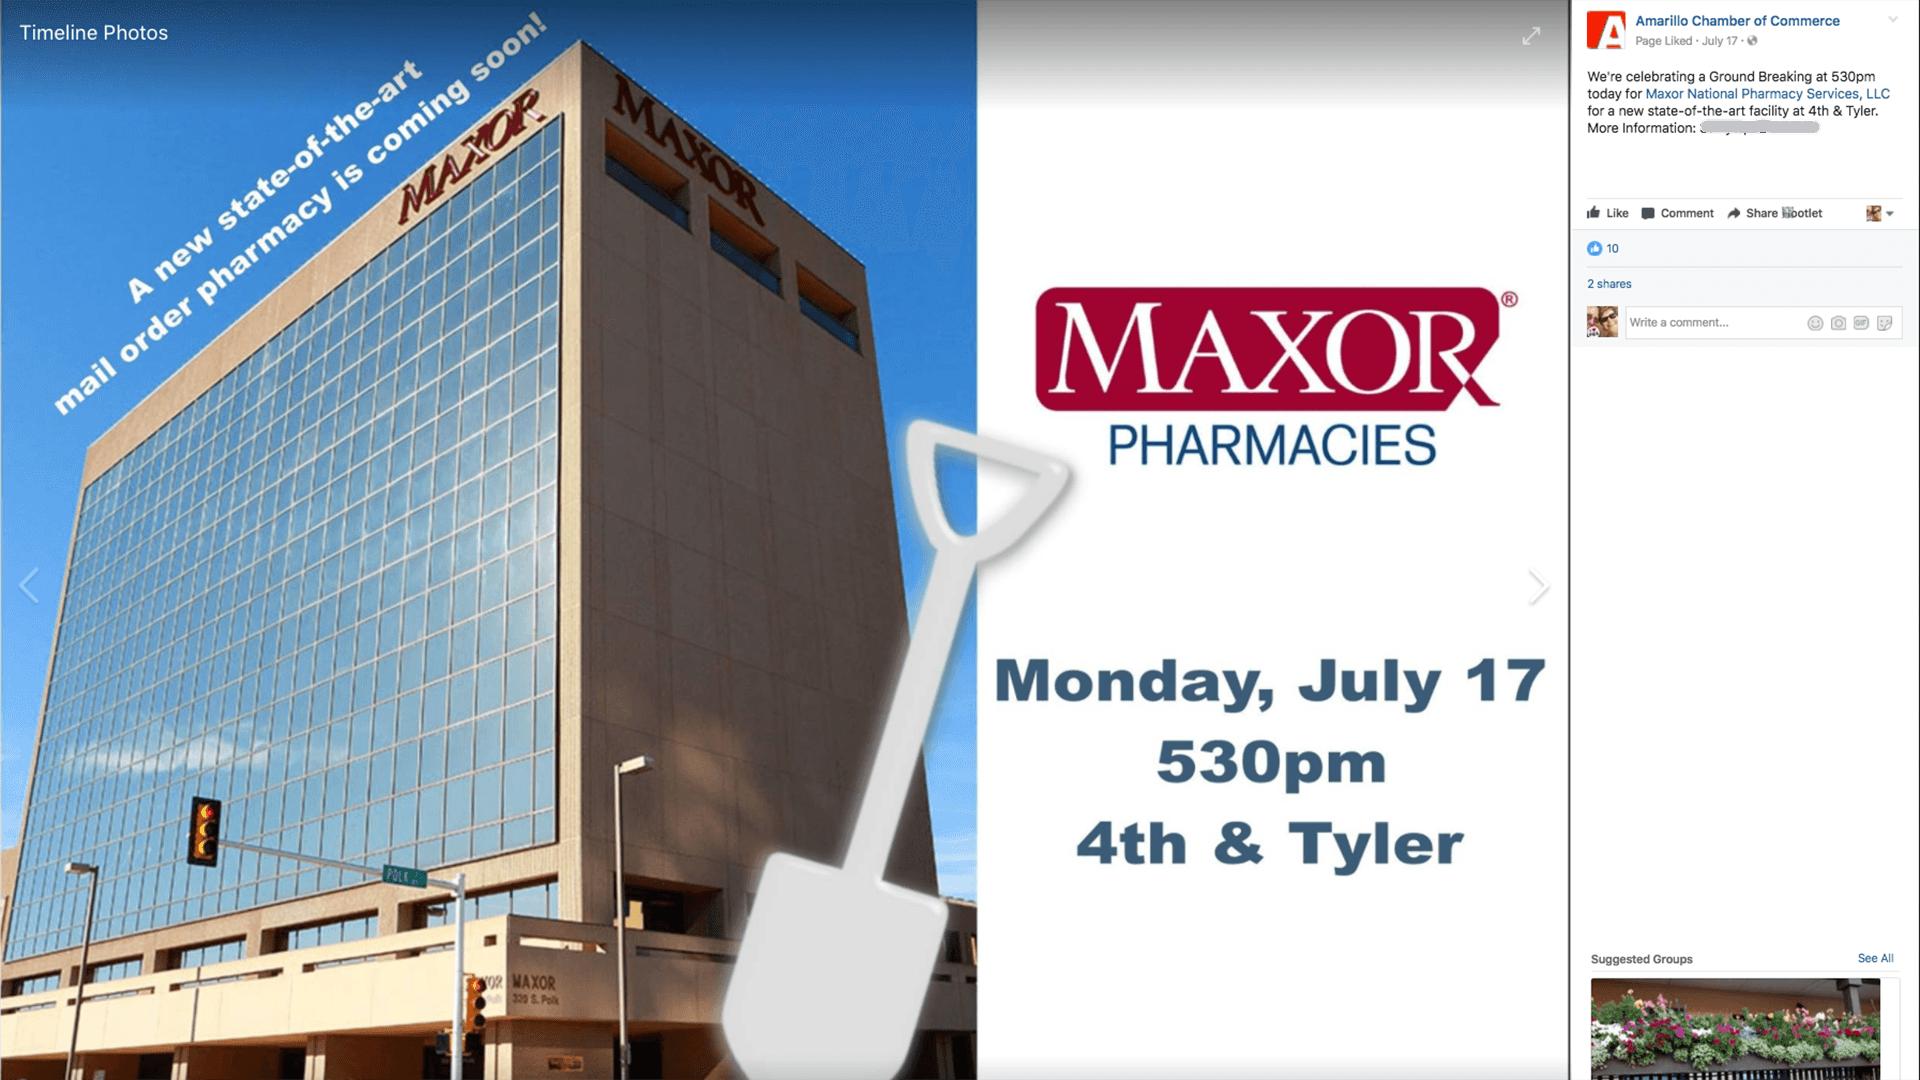 Maxor has a new prescription for downtown Amarillo